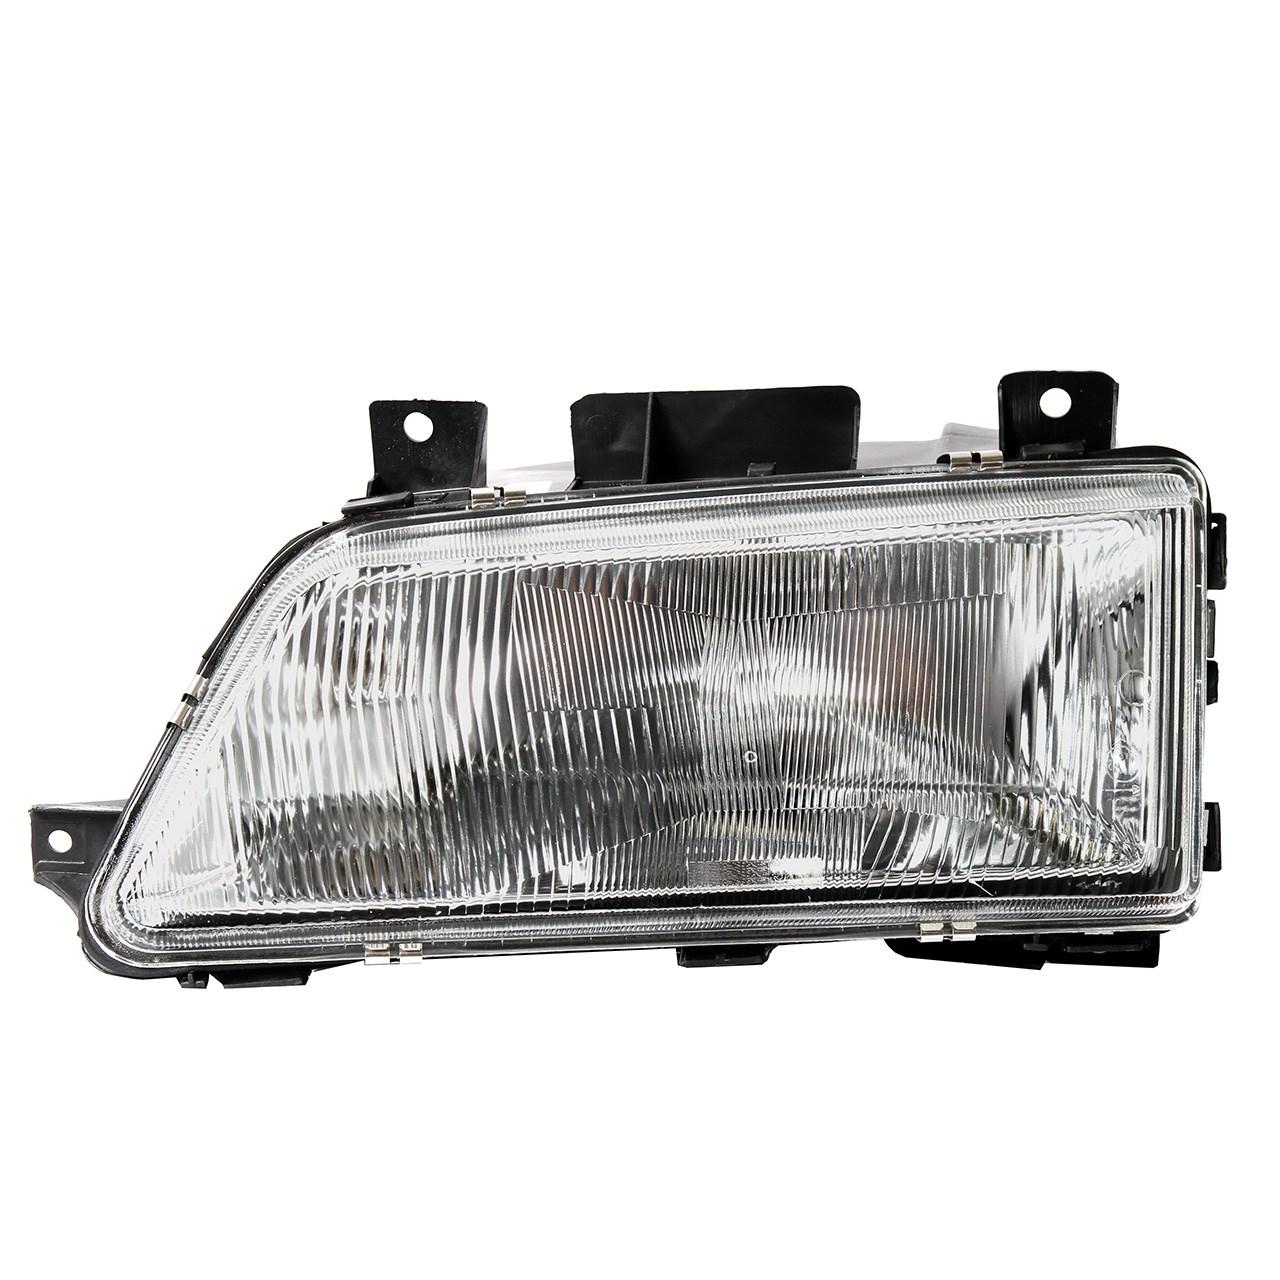 چراغ جلو چپ خودرو اس ان تی مدل SNTP405HL مناسب برای پژو 405